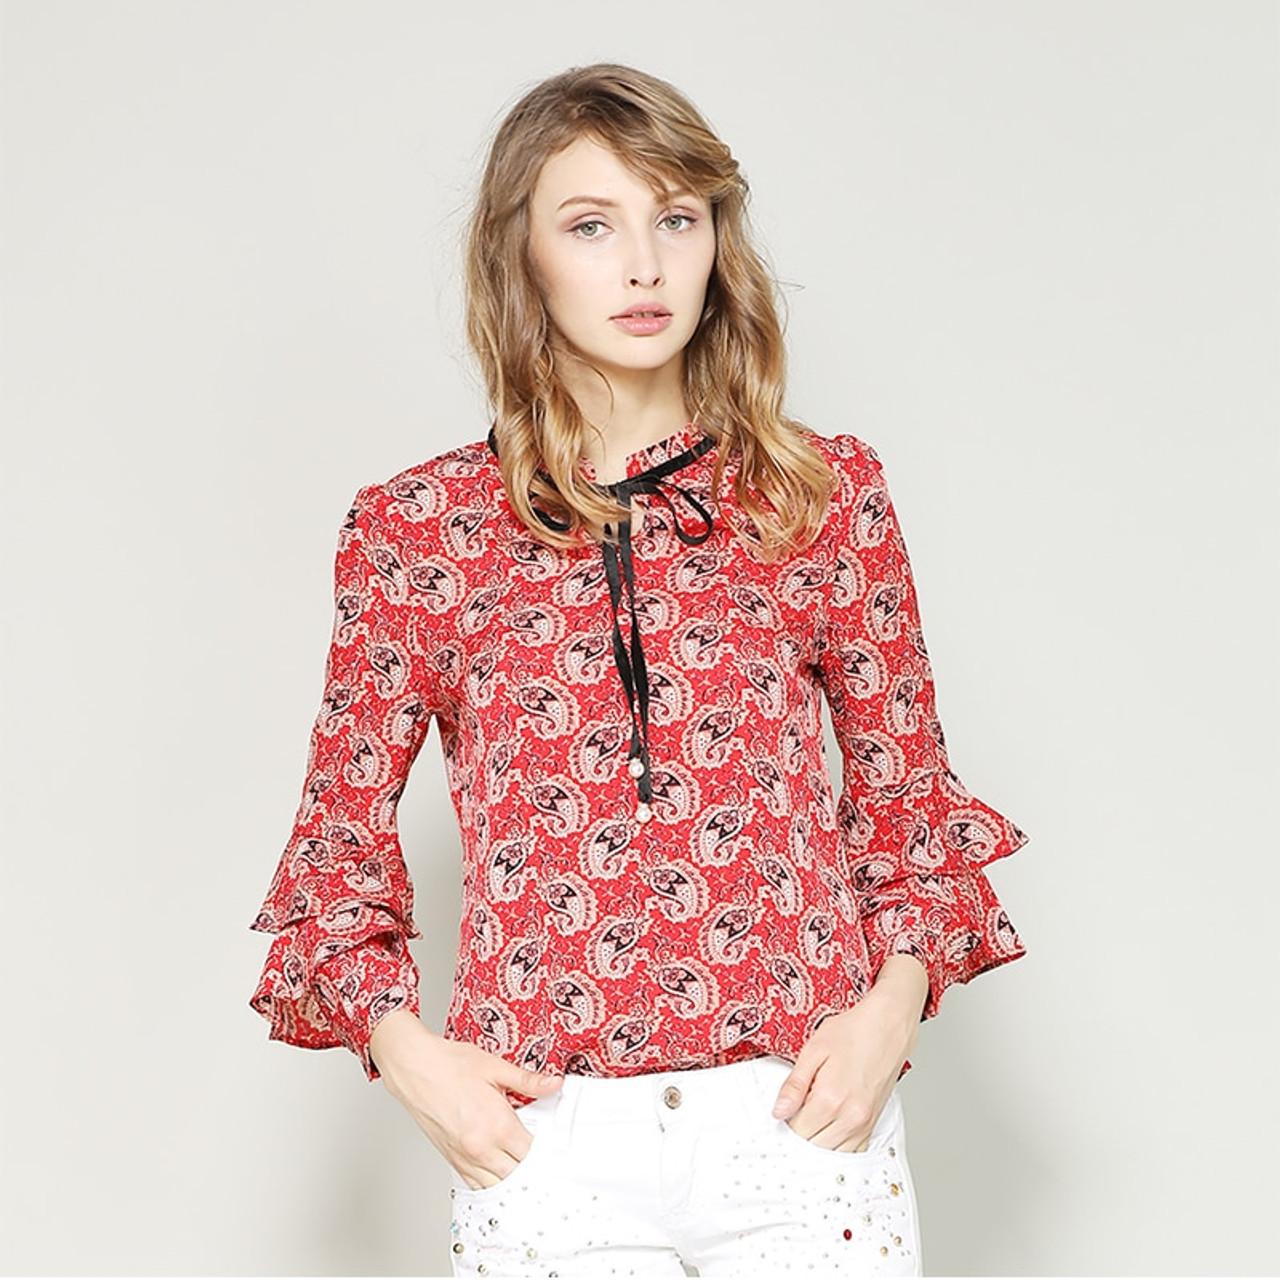 b48446b9cb444 nvyou gou Spring Summer Elegant Long Sleeve Ruffle Layer Chiffon Blouse  Women Vintage Floral Print Fashion Bow Tie Casual Shirt